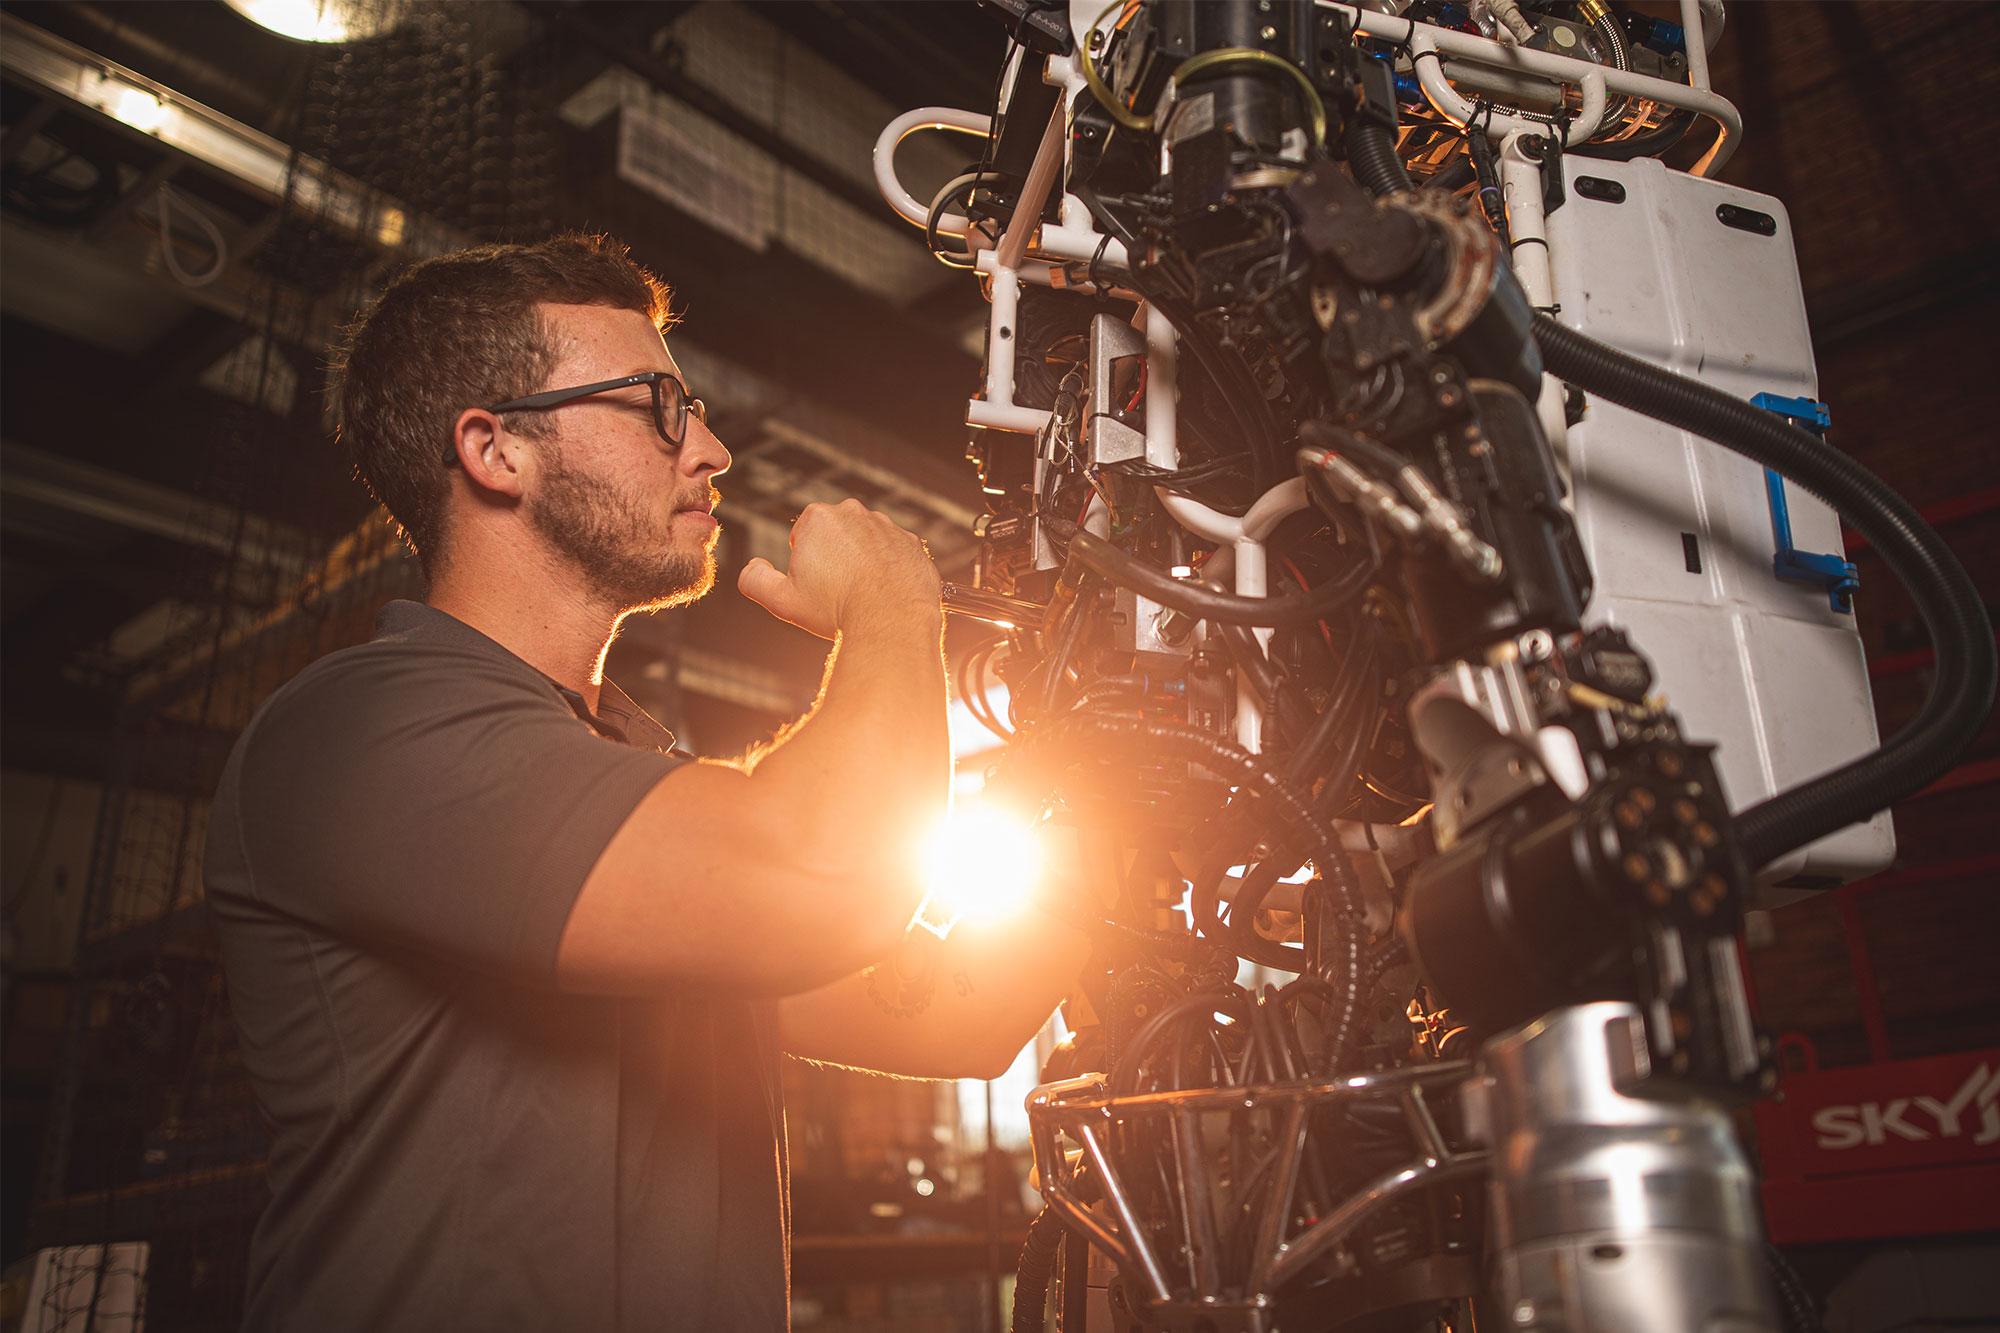 uwf steven thornton working in the robotics lab at IHMC